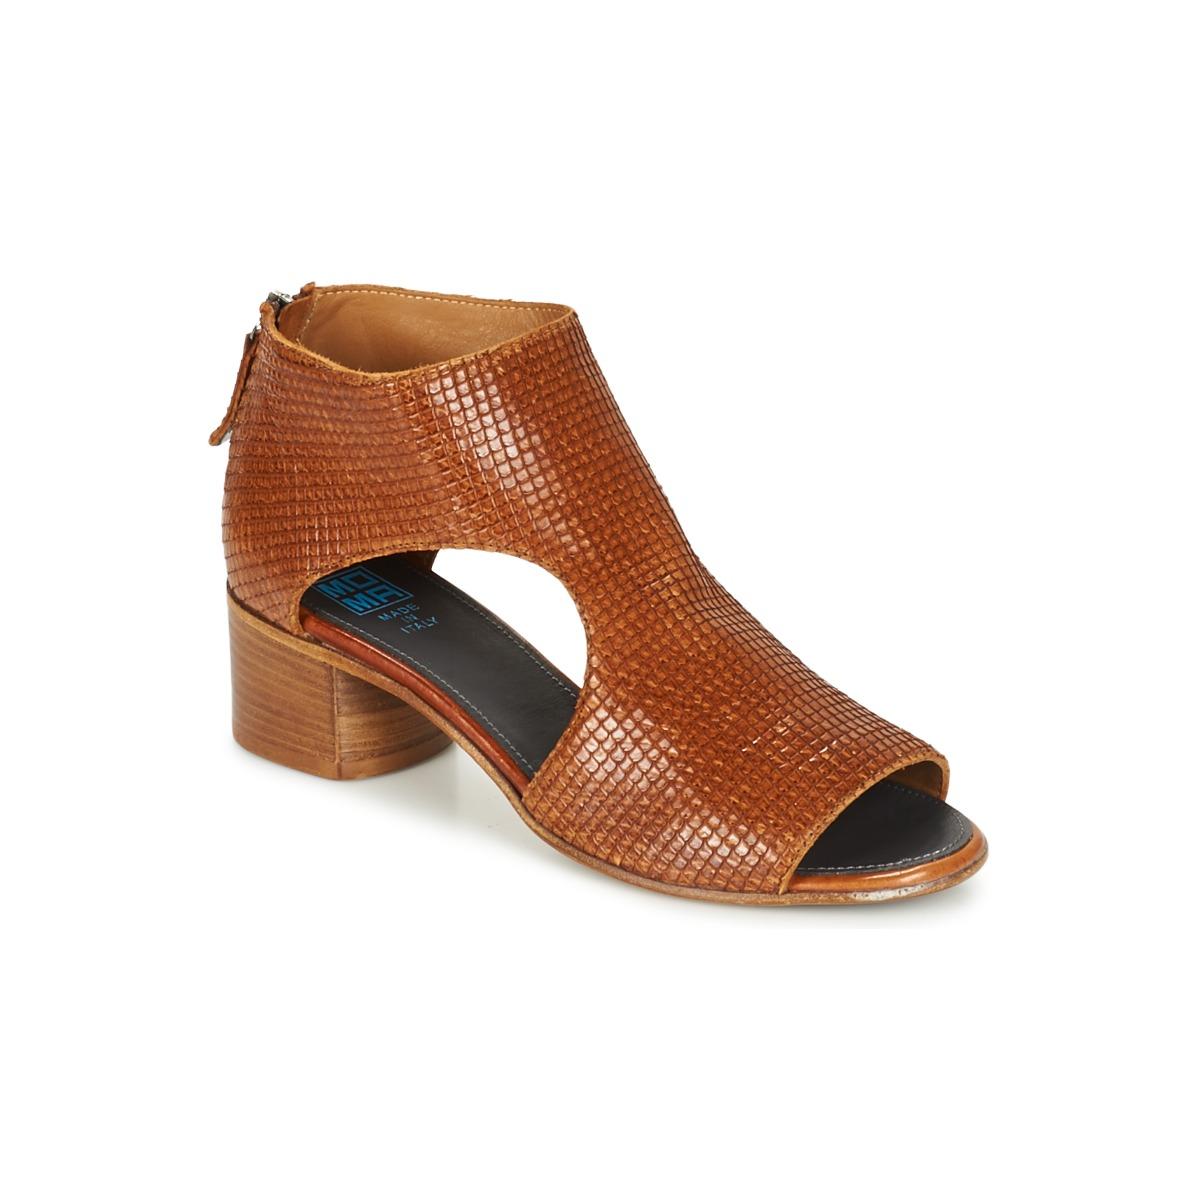 Moma JOBADA Braun - Kostenloser Versand bei Spartoode ! - Schuhe Sandalen / Sandaletten Damen 223,30 €